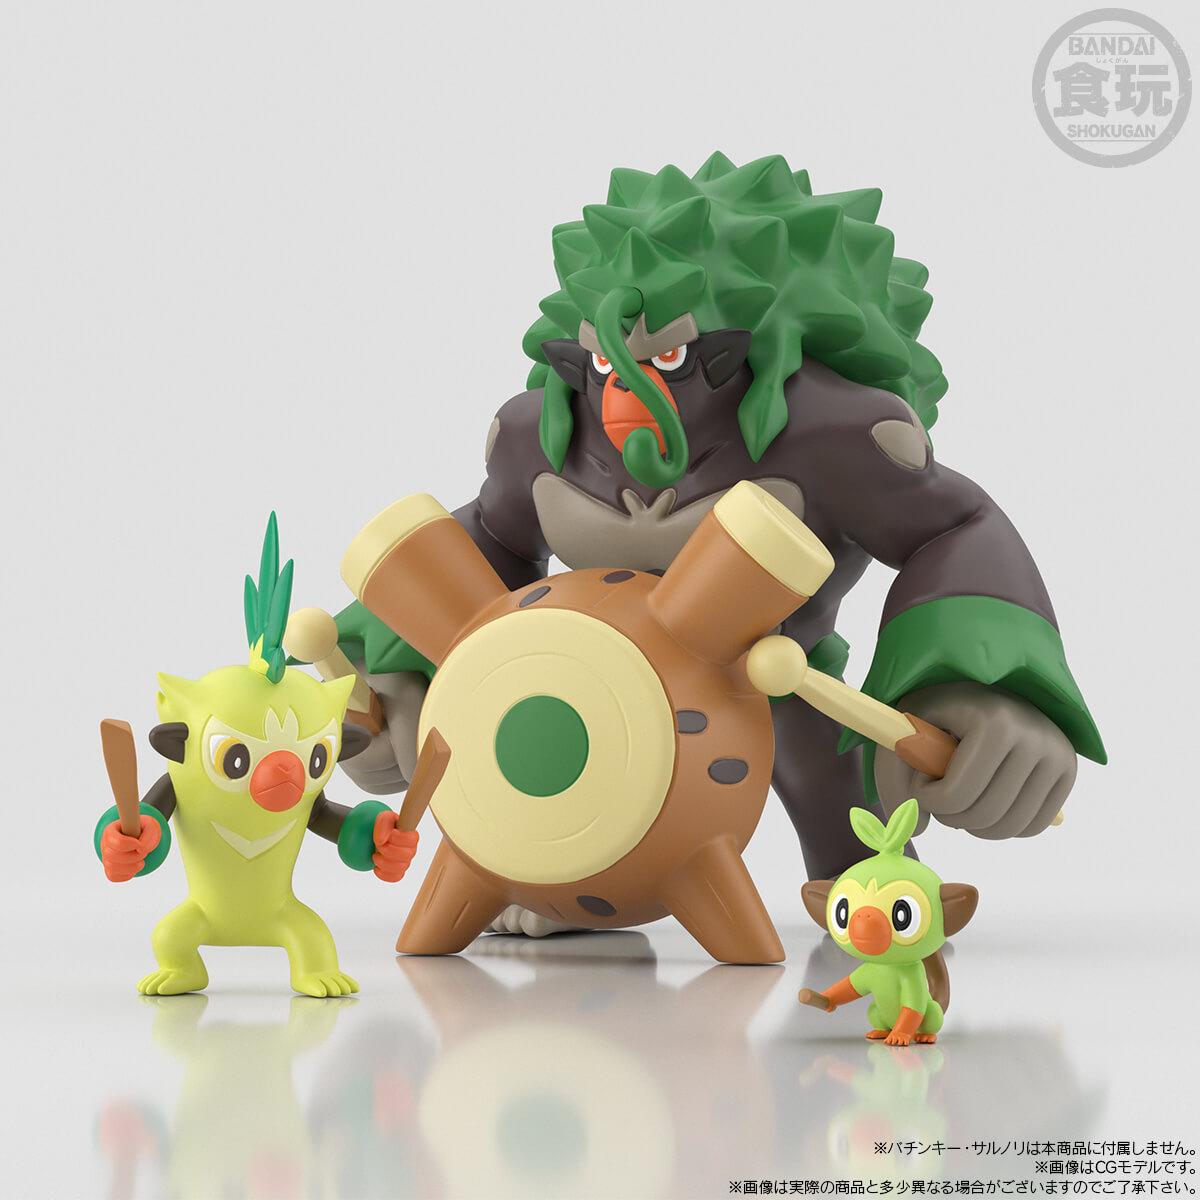 pokemon-%e3%83%9d%e3%82%b1%e3%83%a2%e3%83%b3-%e5%af%b6%e5%8f%af%e5%a4%a2_2-2